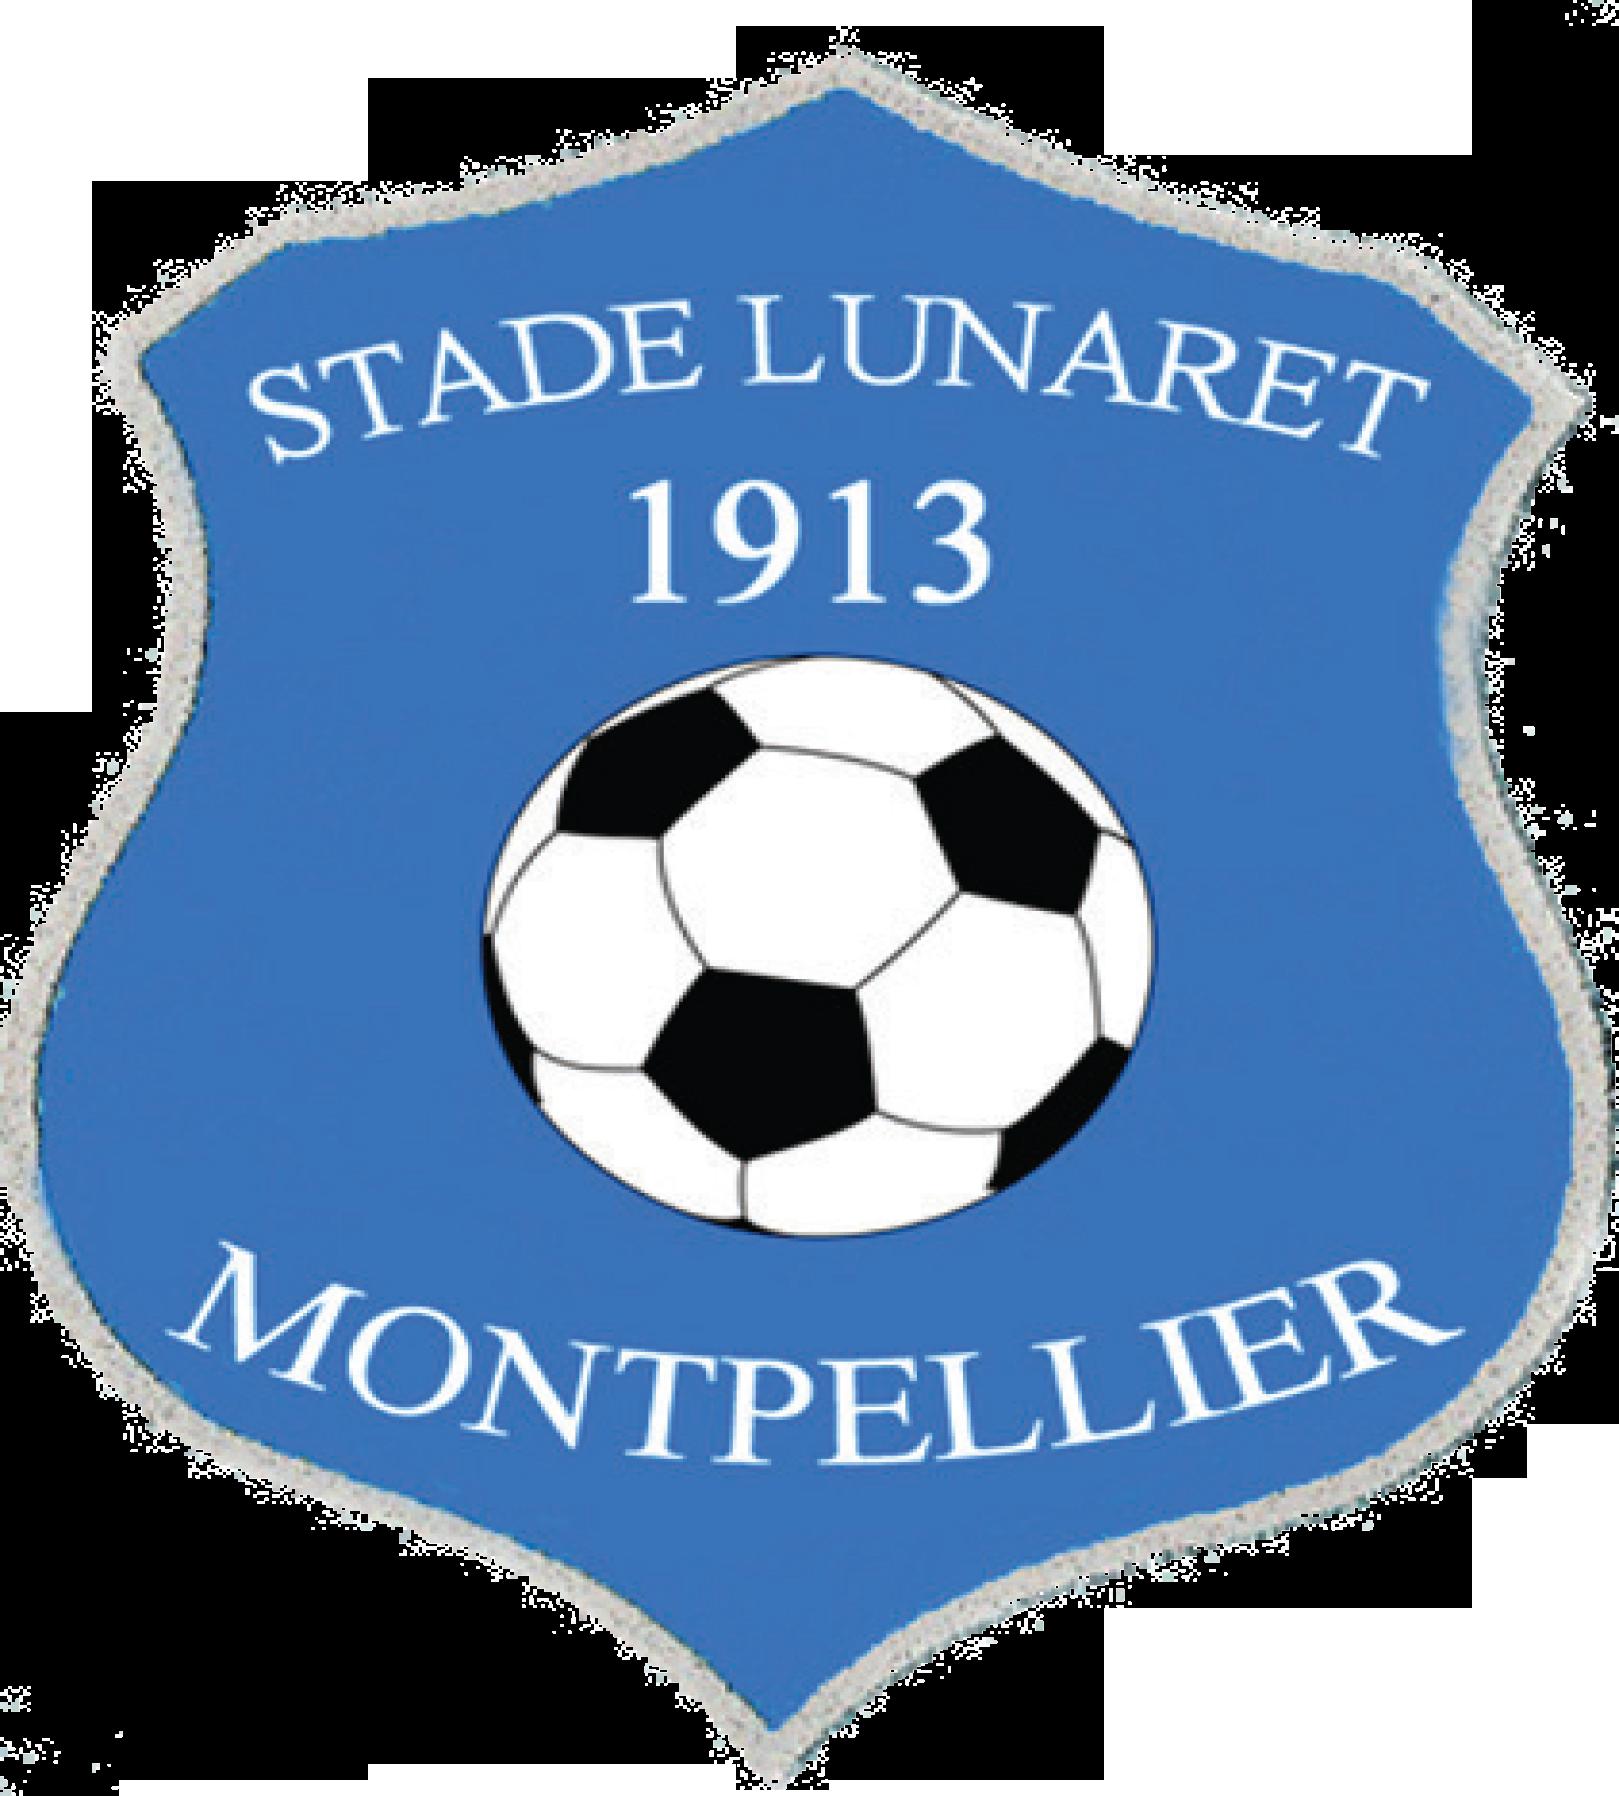 Stade Lunaret Football